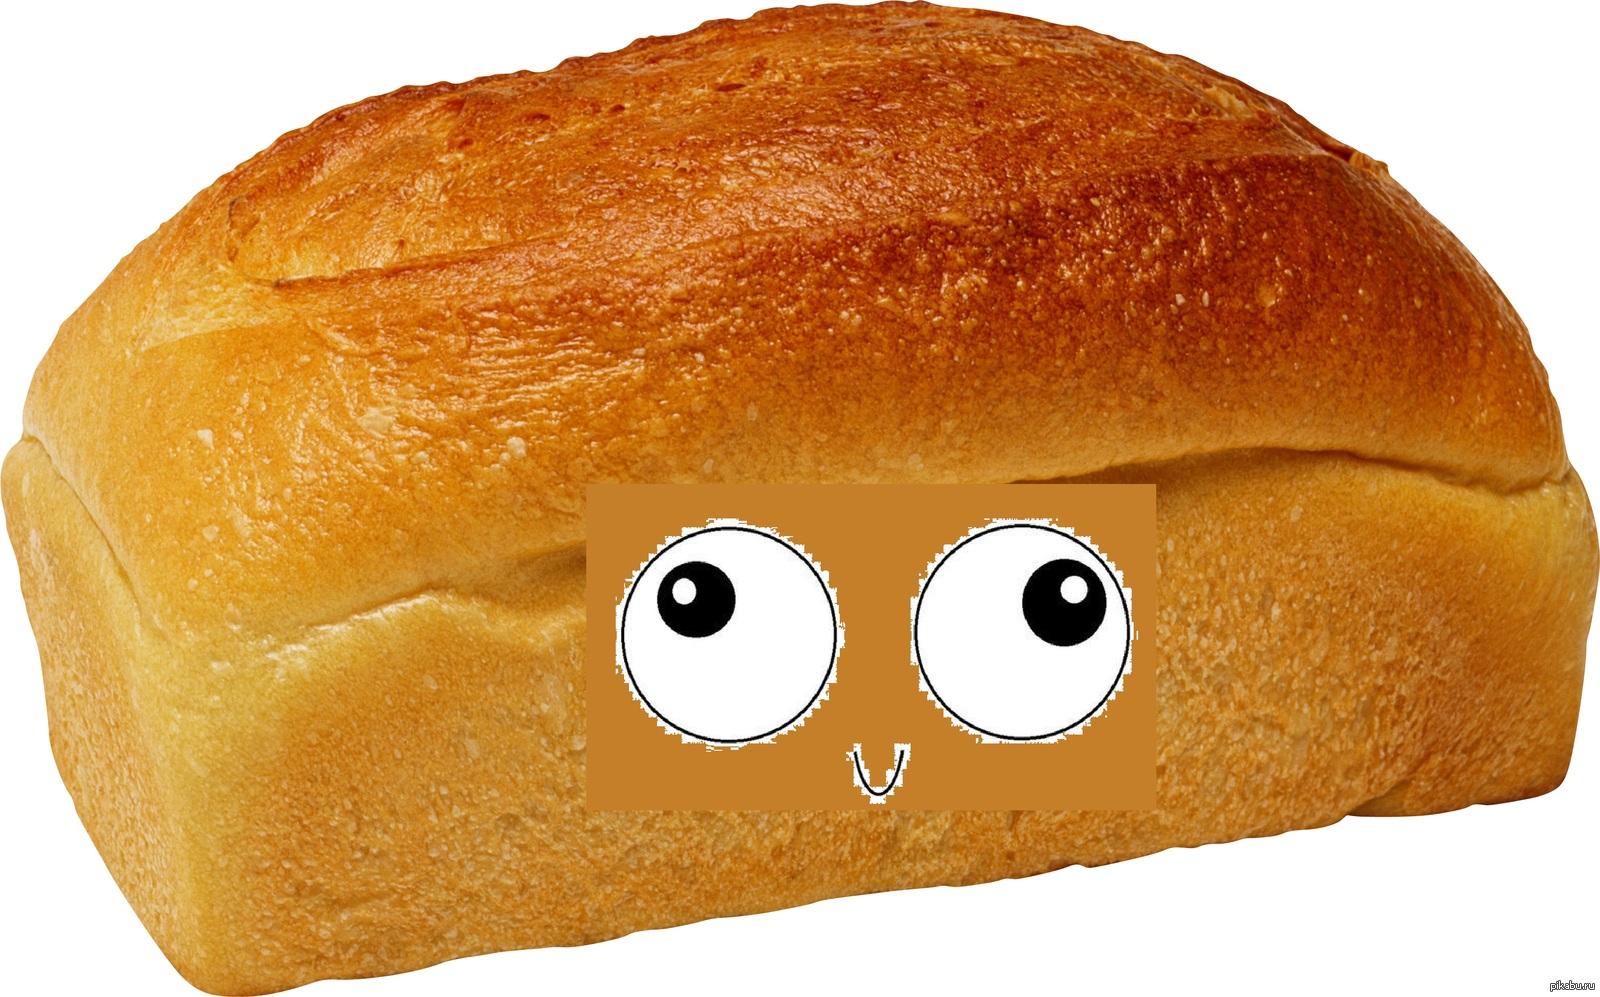 говорящий хлеб картинки